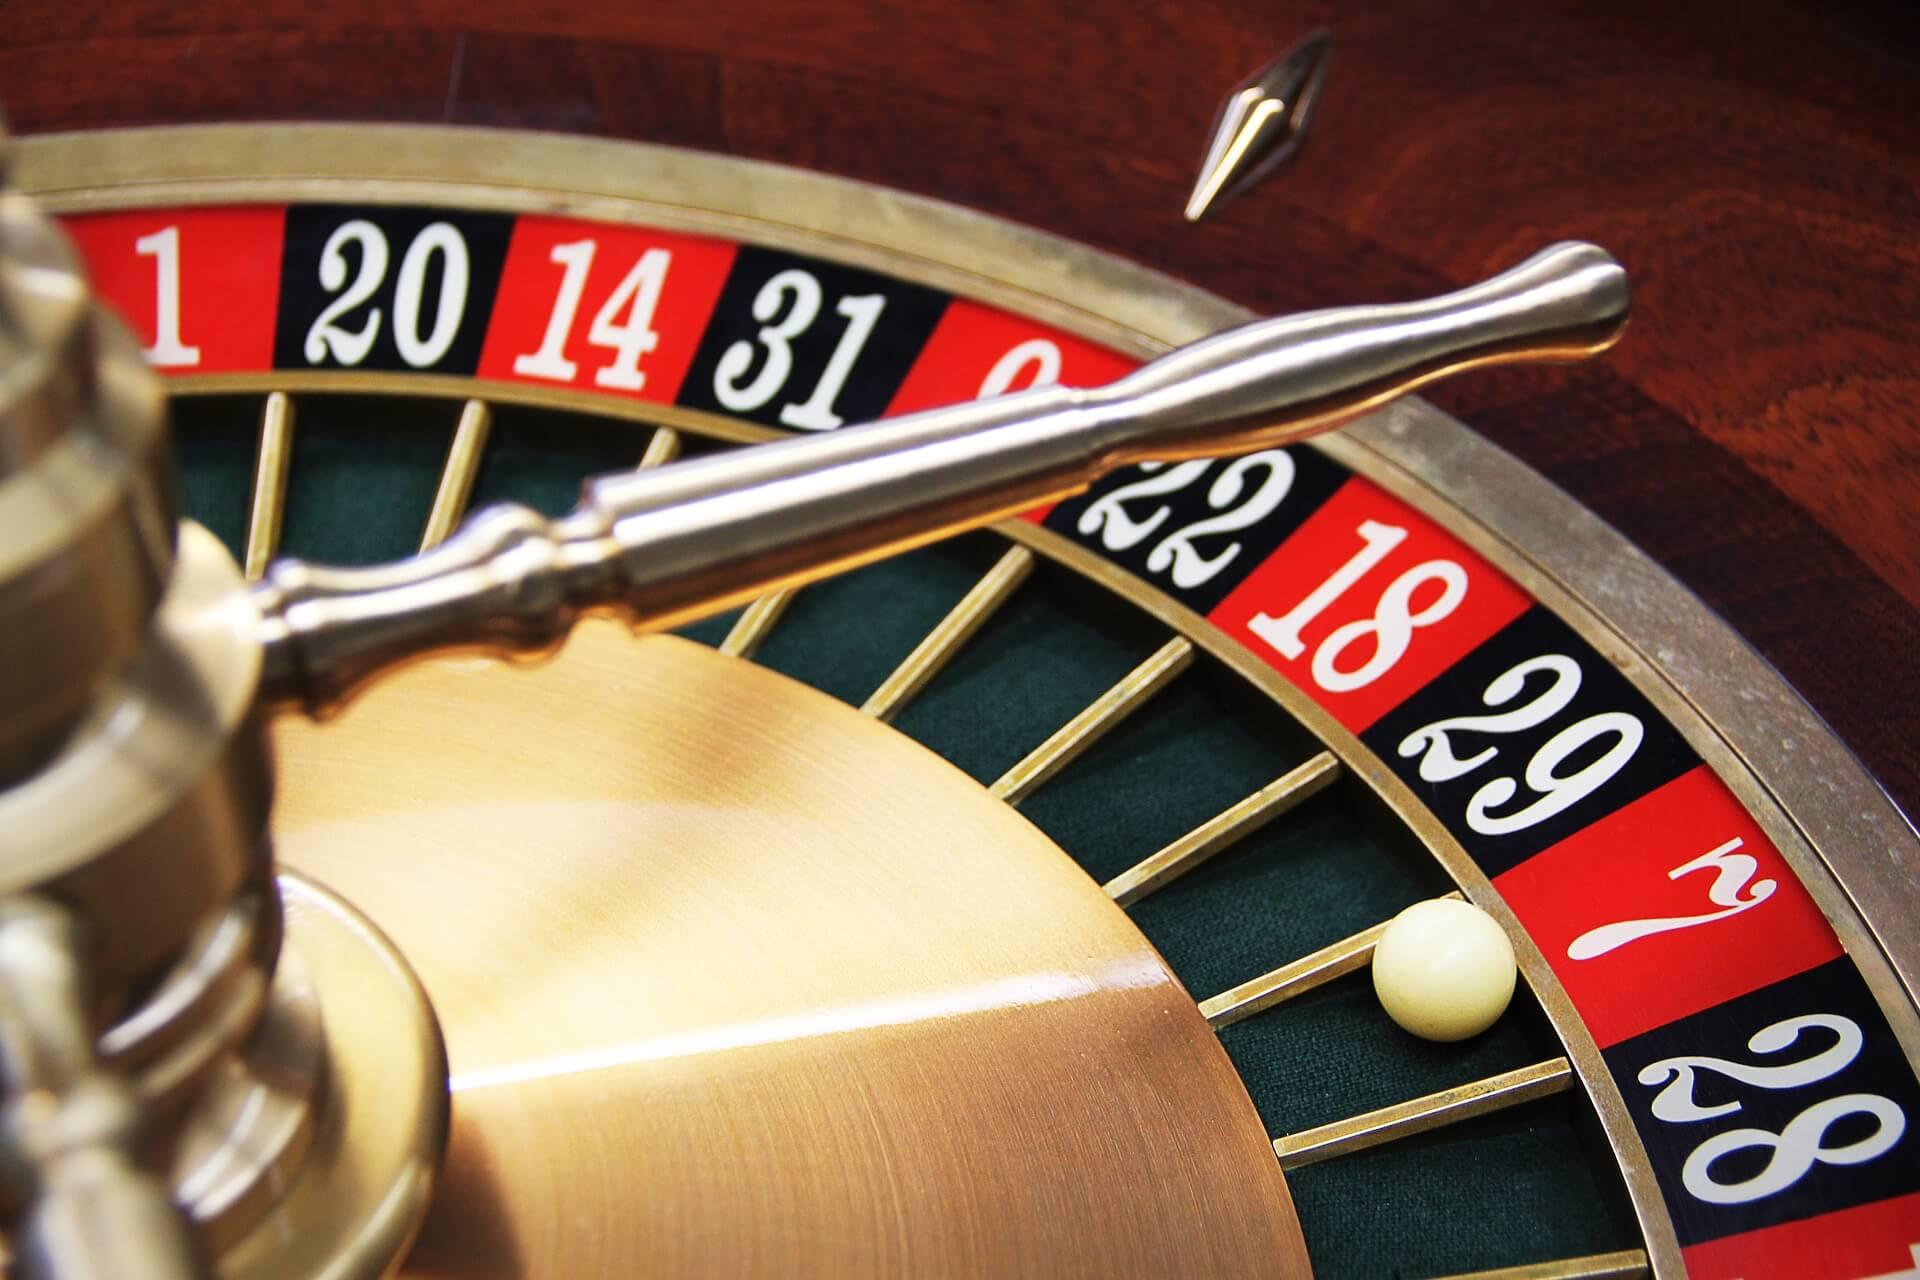 Müssen Casinogewinne versteuert werden?